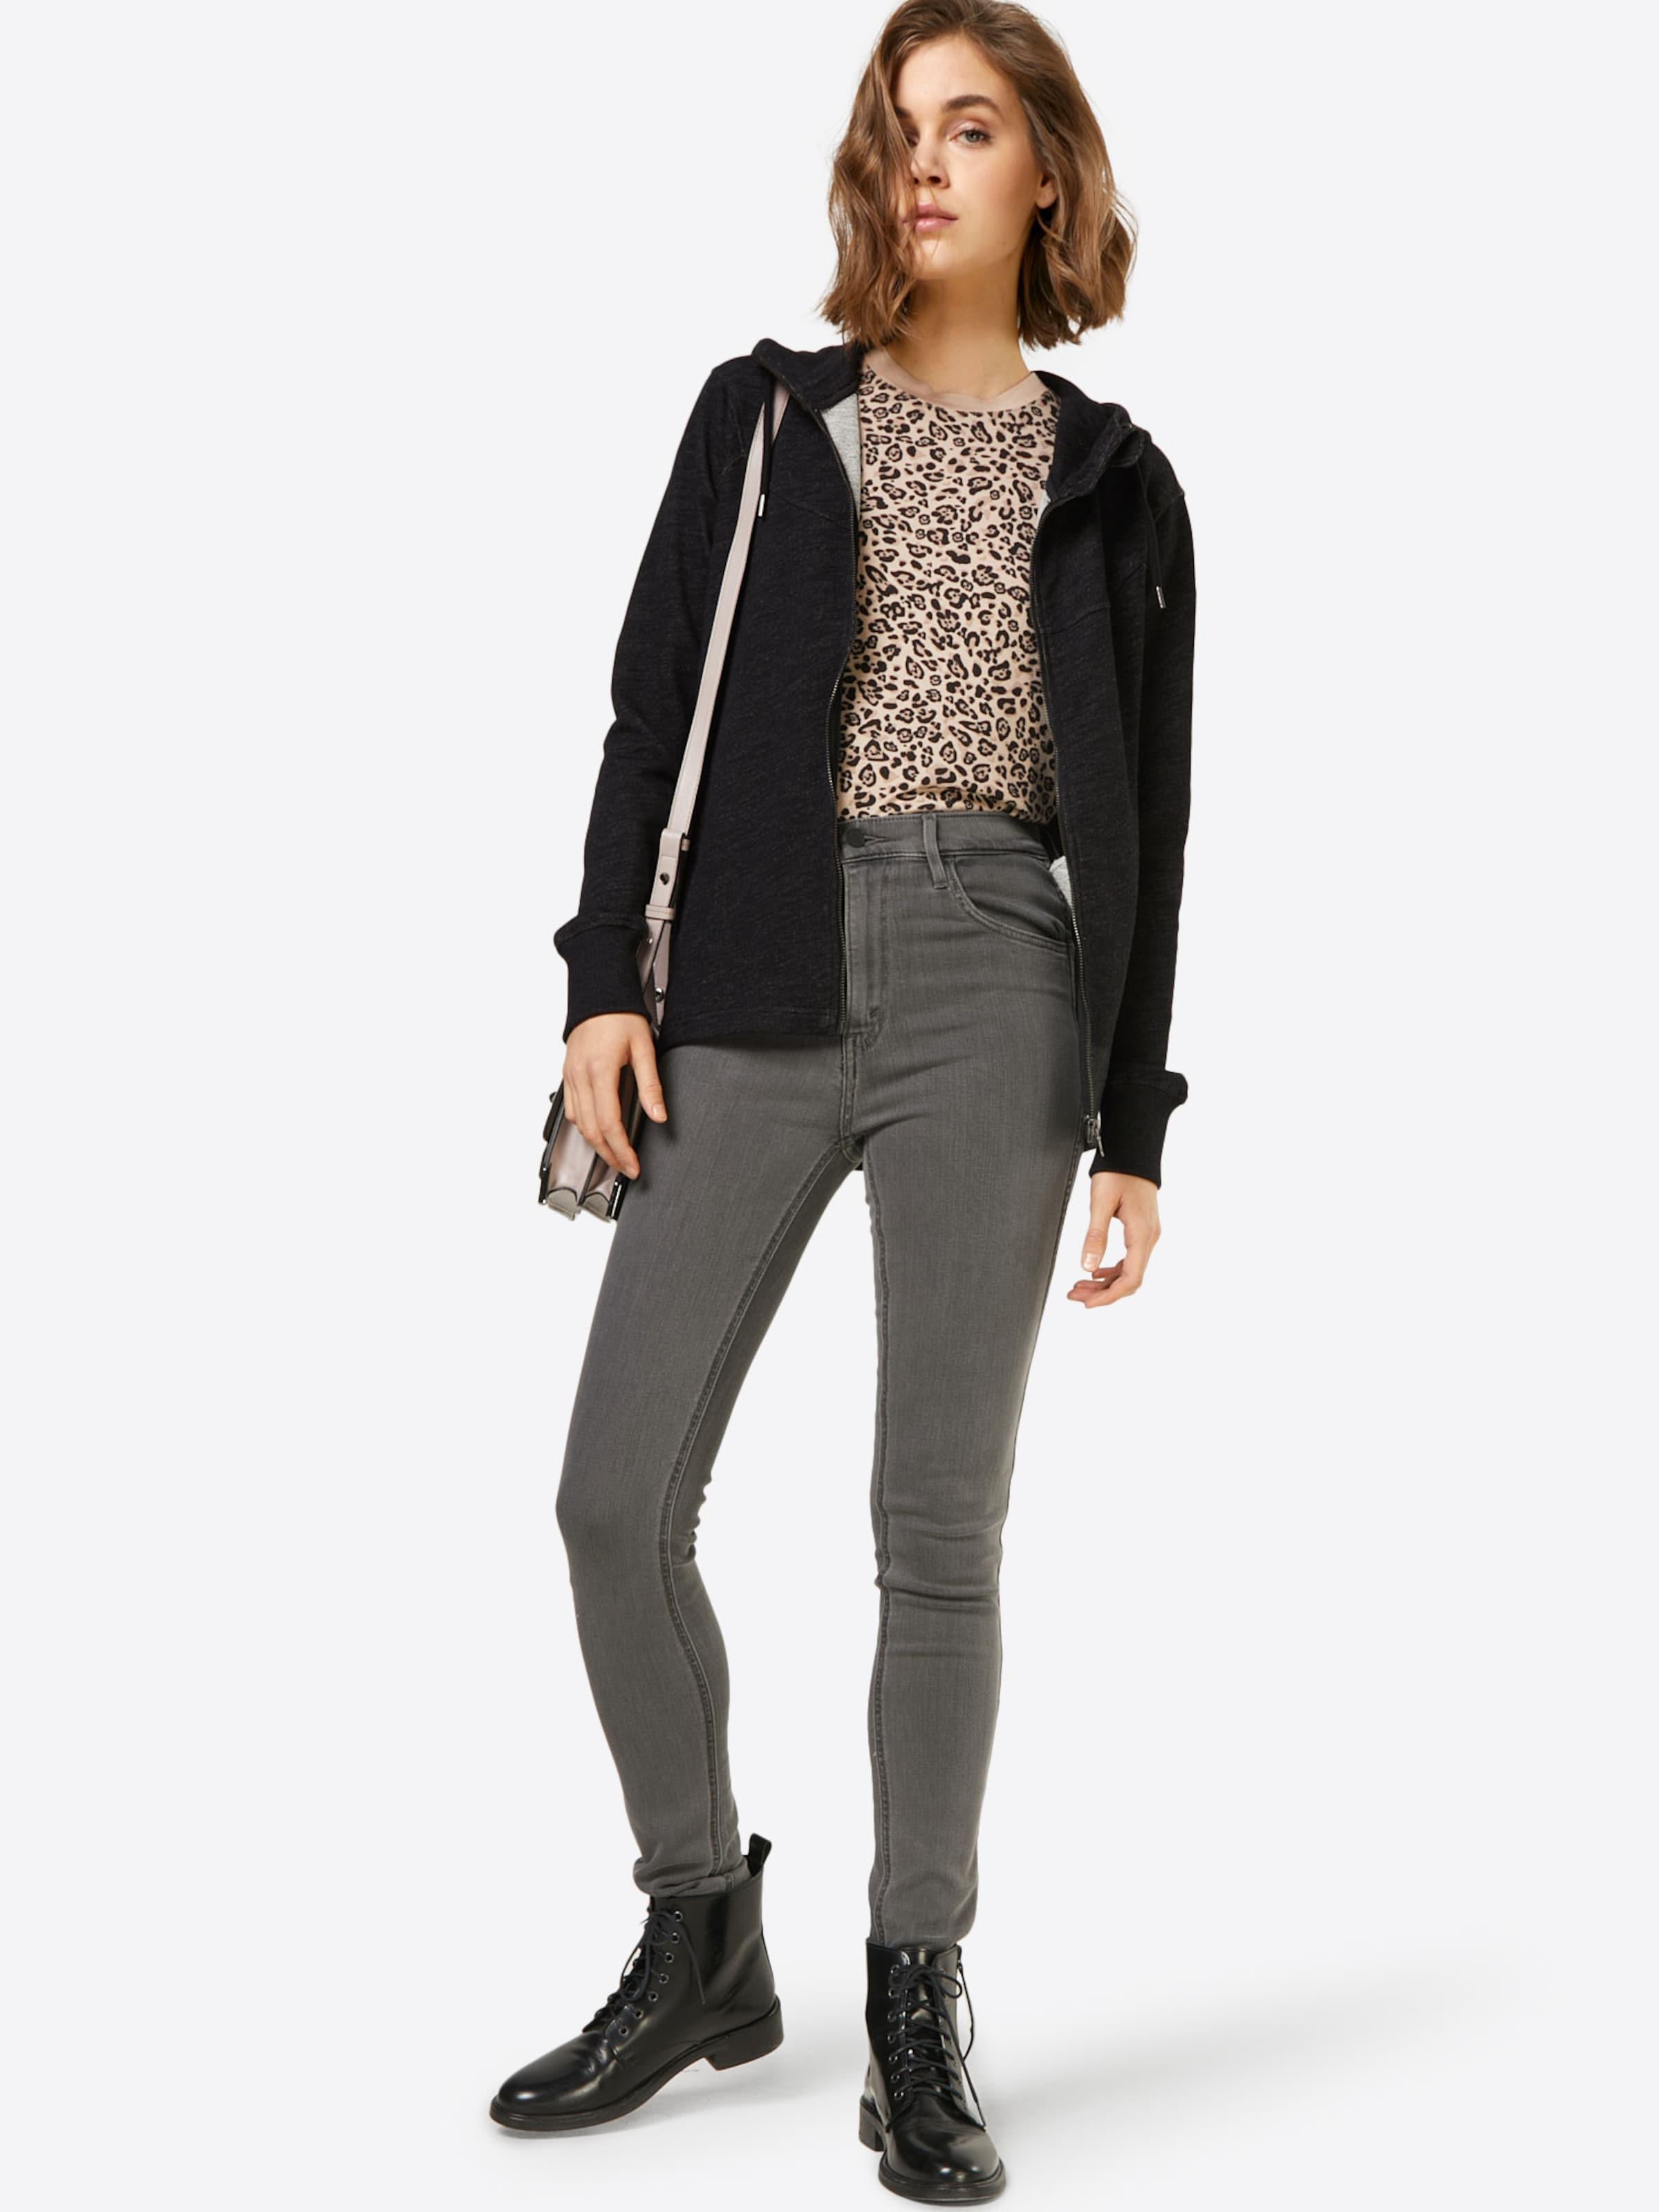 In Deutschland Billig Auslass Gut Verkaufen recolution Sweatshirt 'Zipper Deluxe' Angebot Footaction Online Limited Edition Online oIHSsPy7J